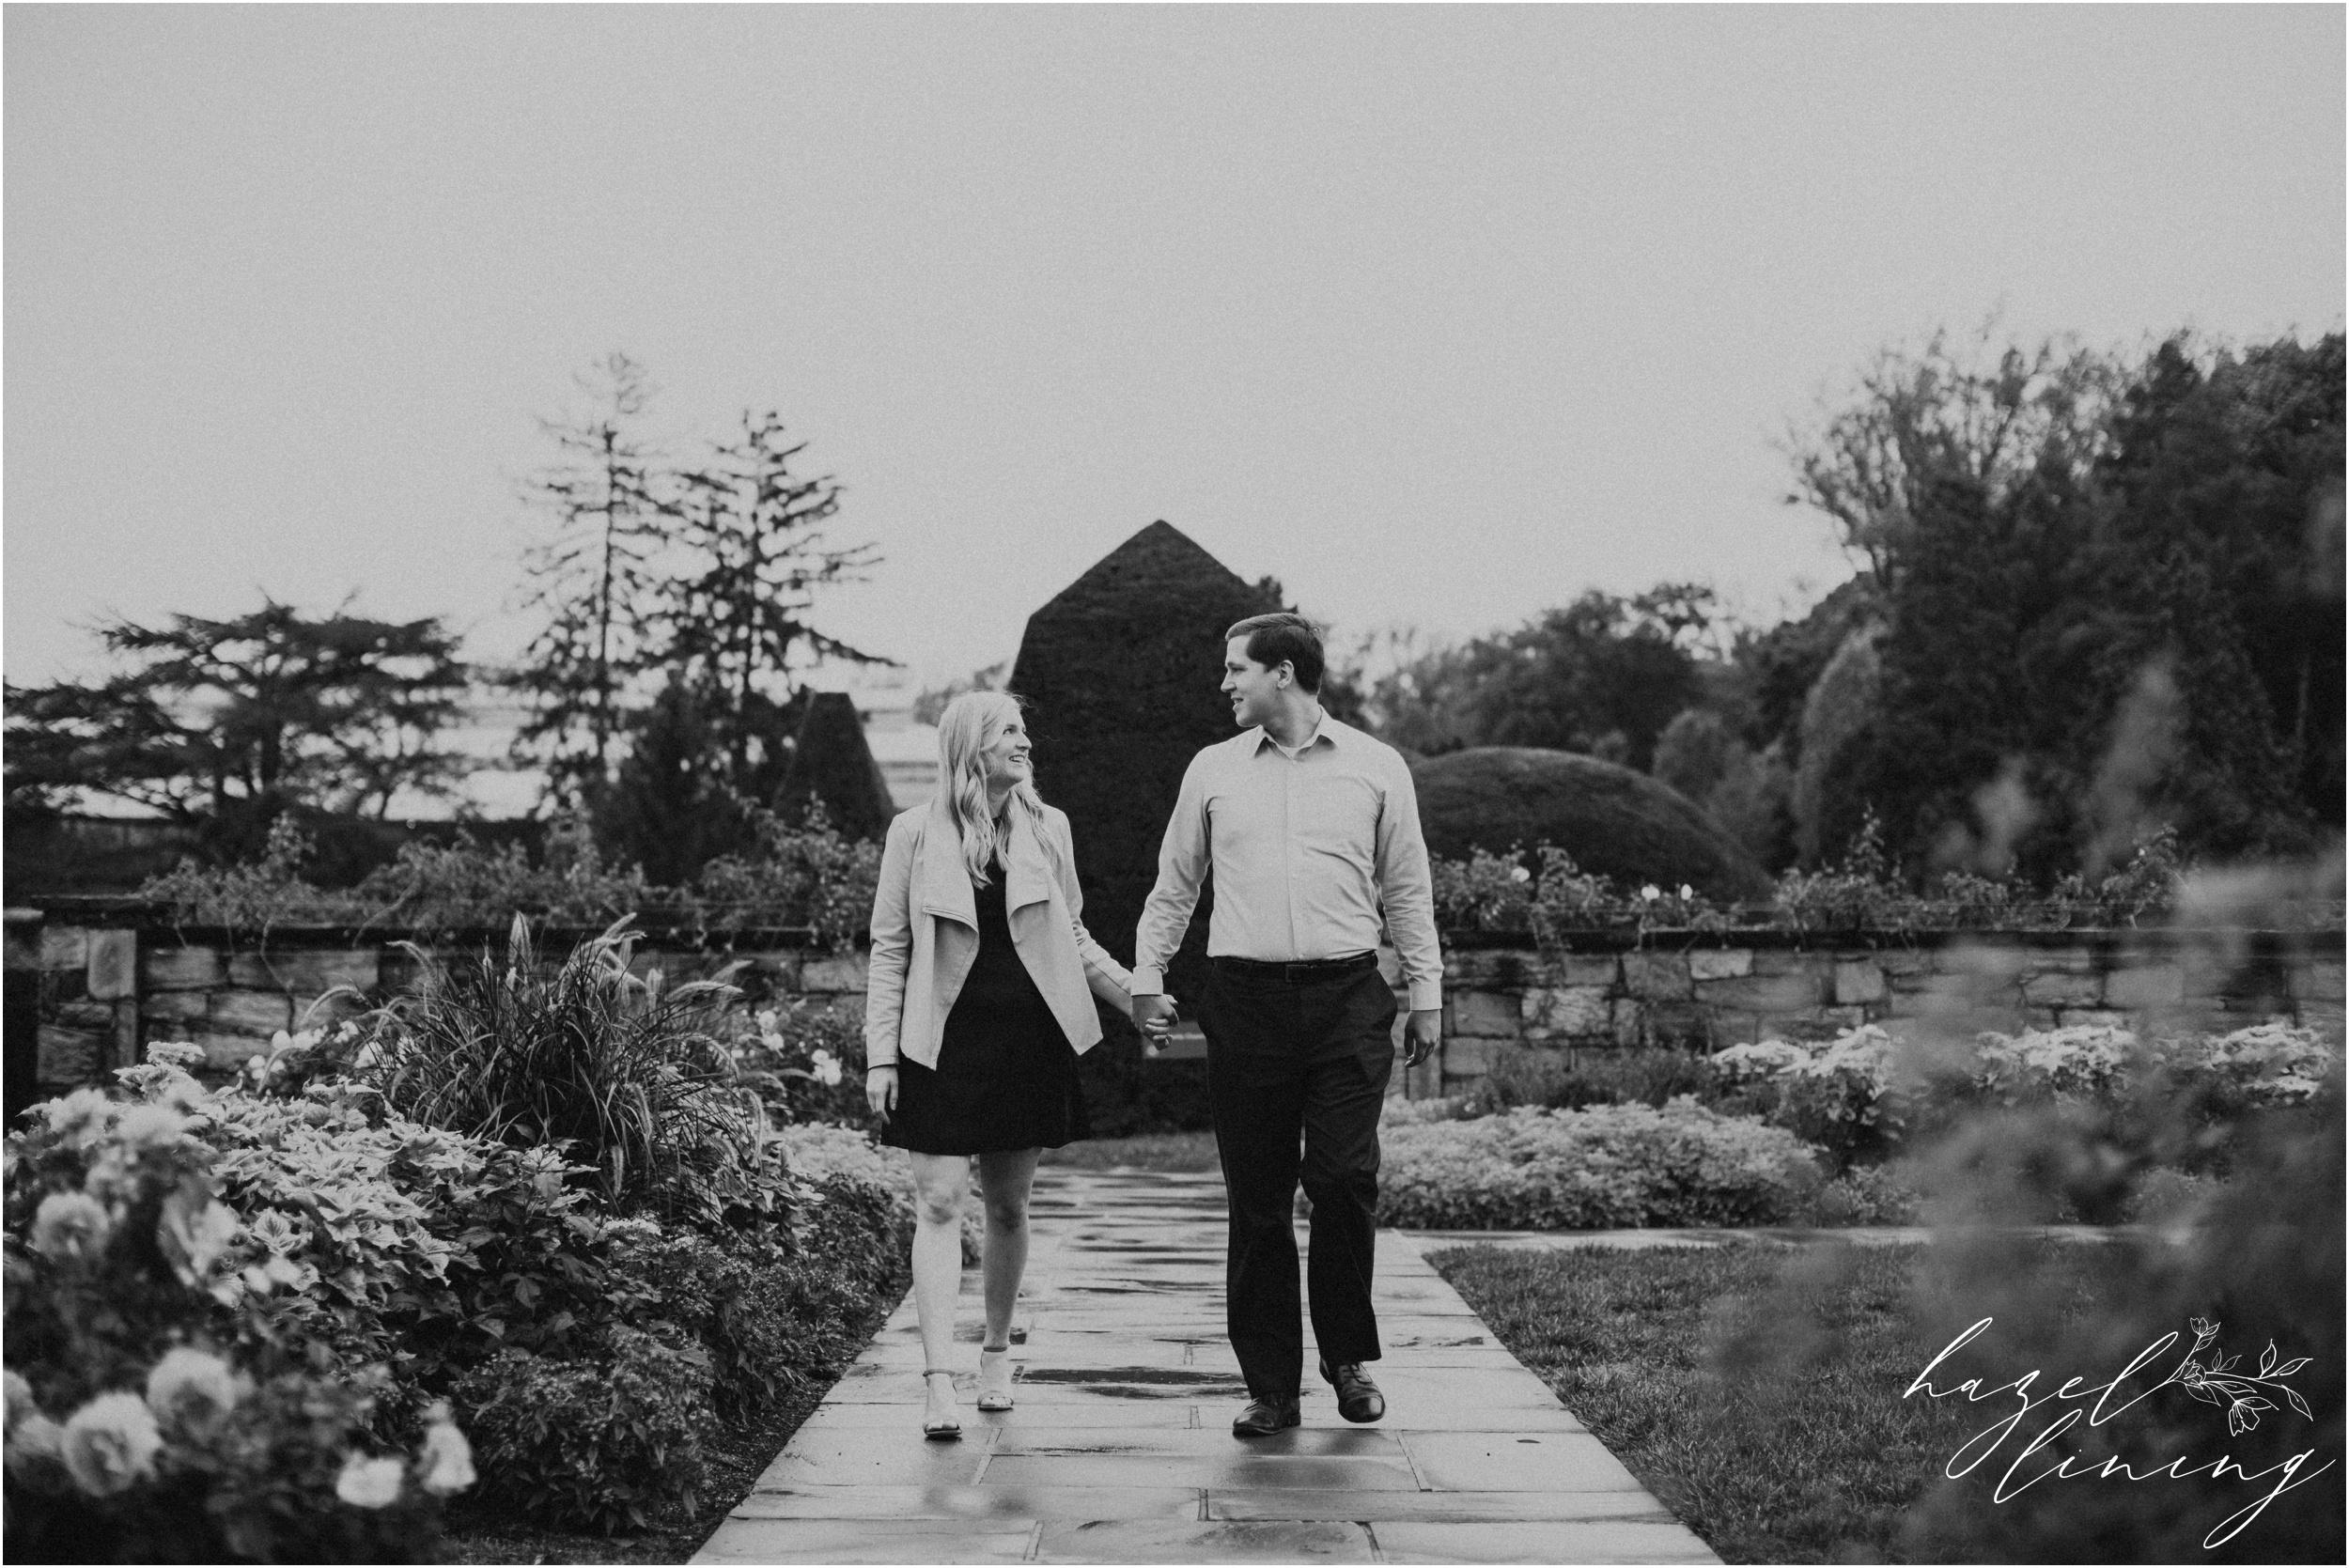 victoria-travis-logan-mayes-longwood-gardens-kennett-square-philadelphia-engagement-session-hazel-lining-photography-destination-elopement-wedding-engagement-photography_0006.jpg